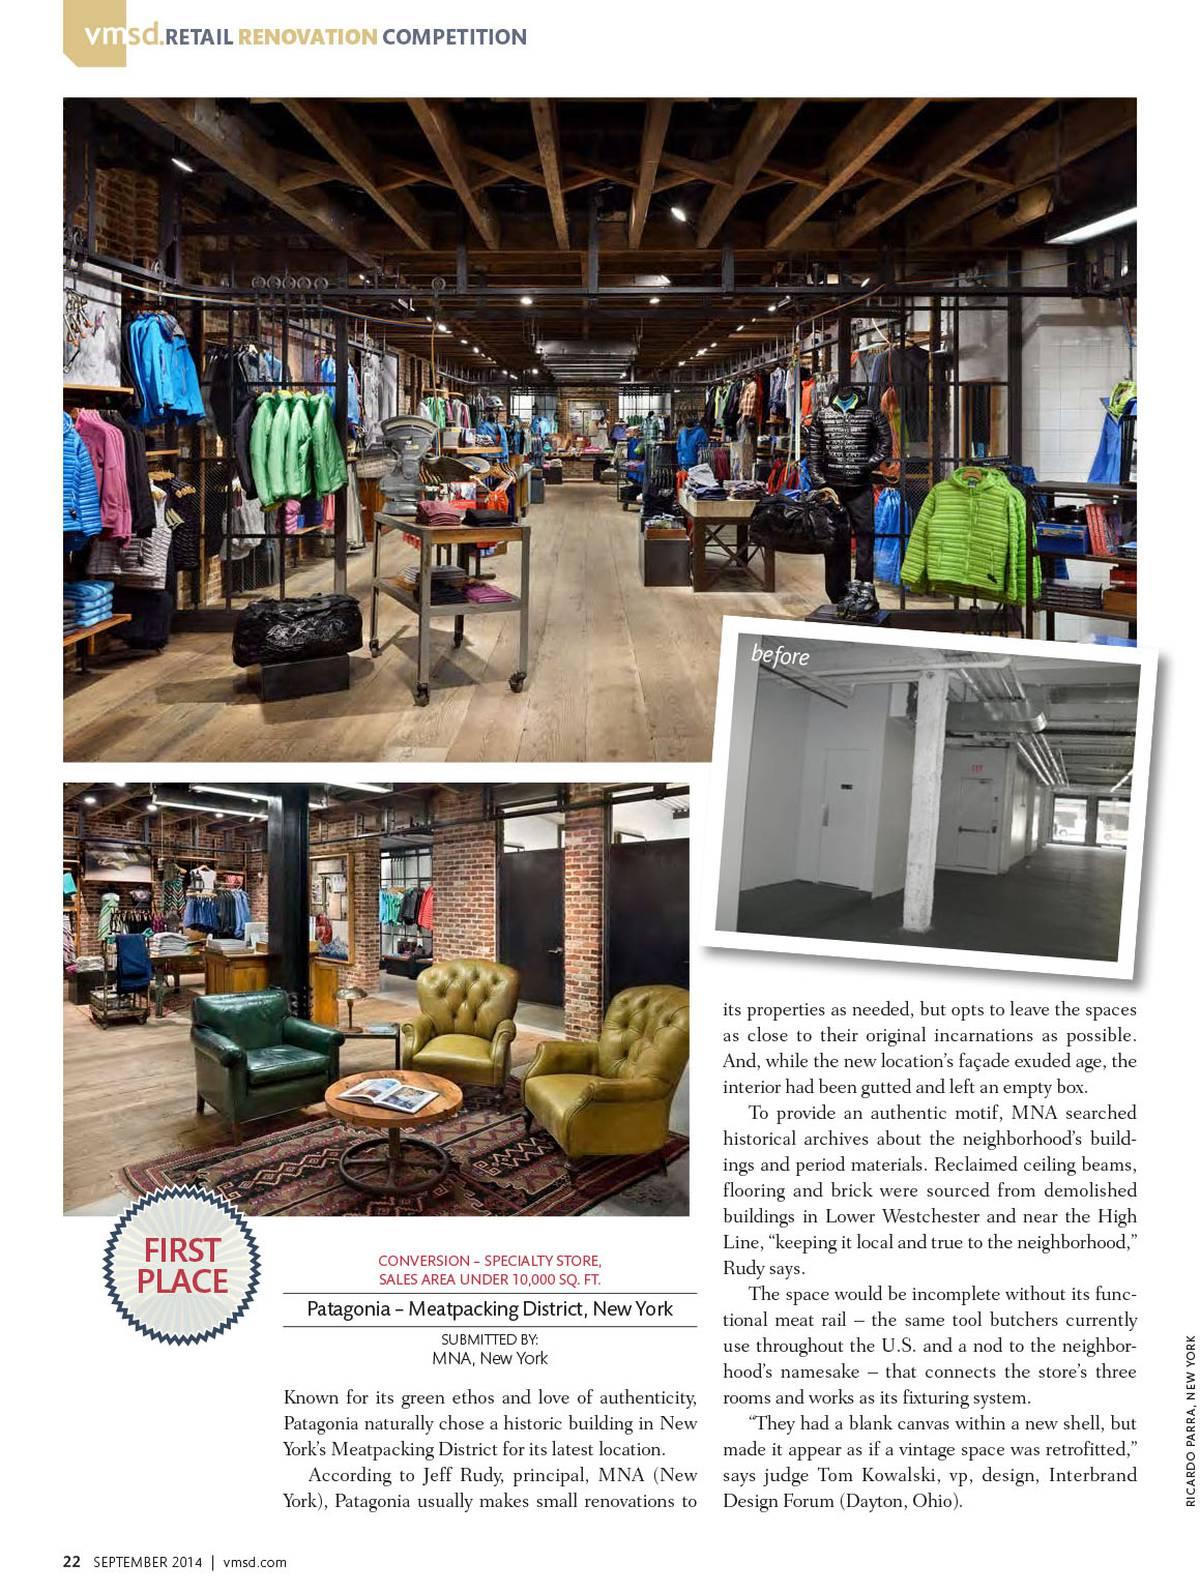 VMSD Retail Renovation Award Winner - Patagonia, Meatpacking, NYC - Architect: Neumann & Rudy